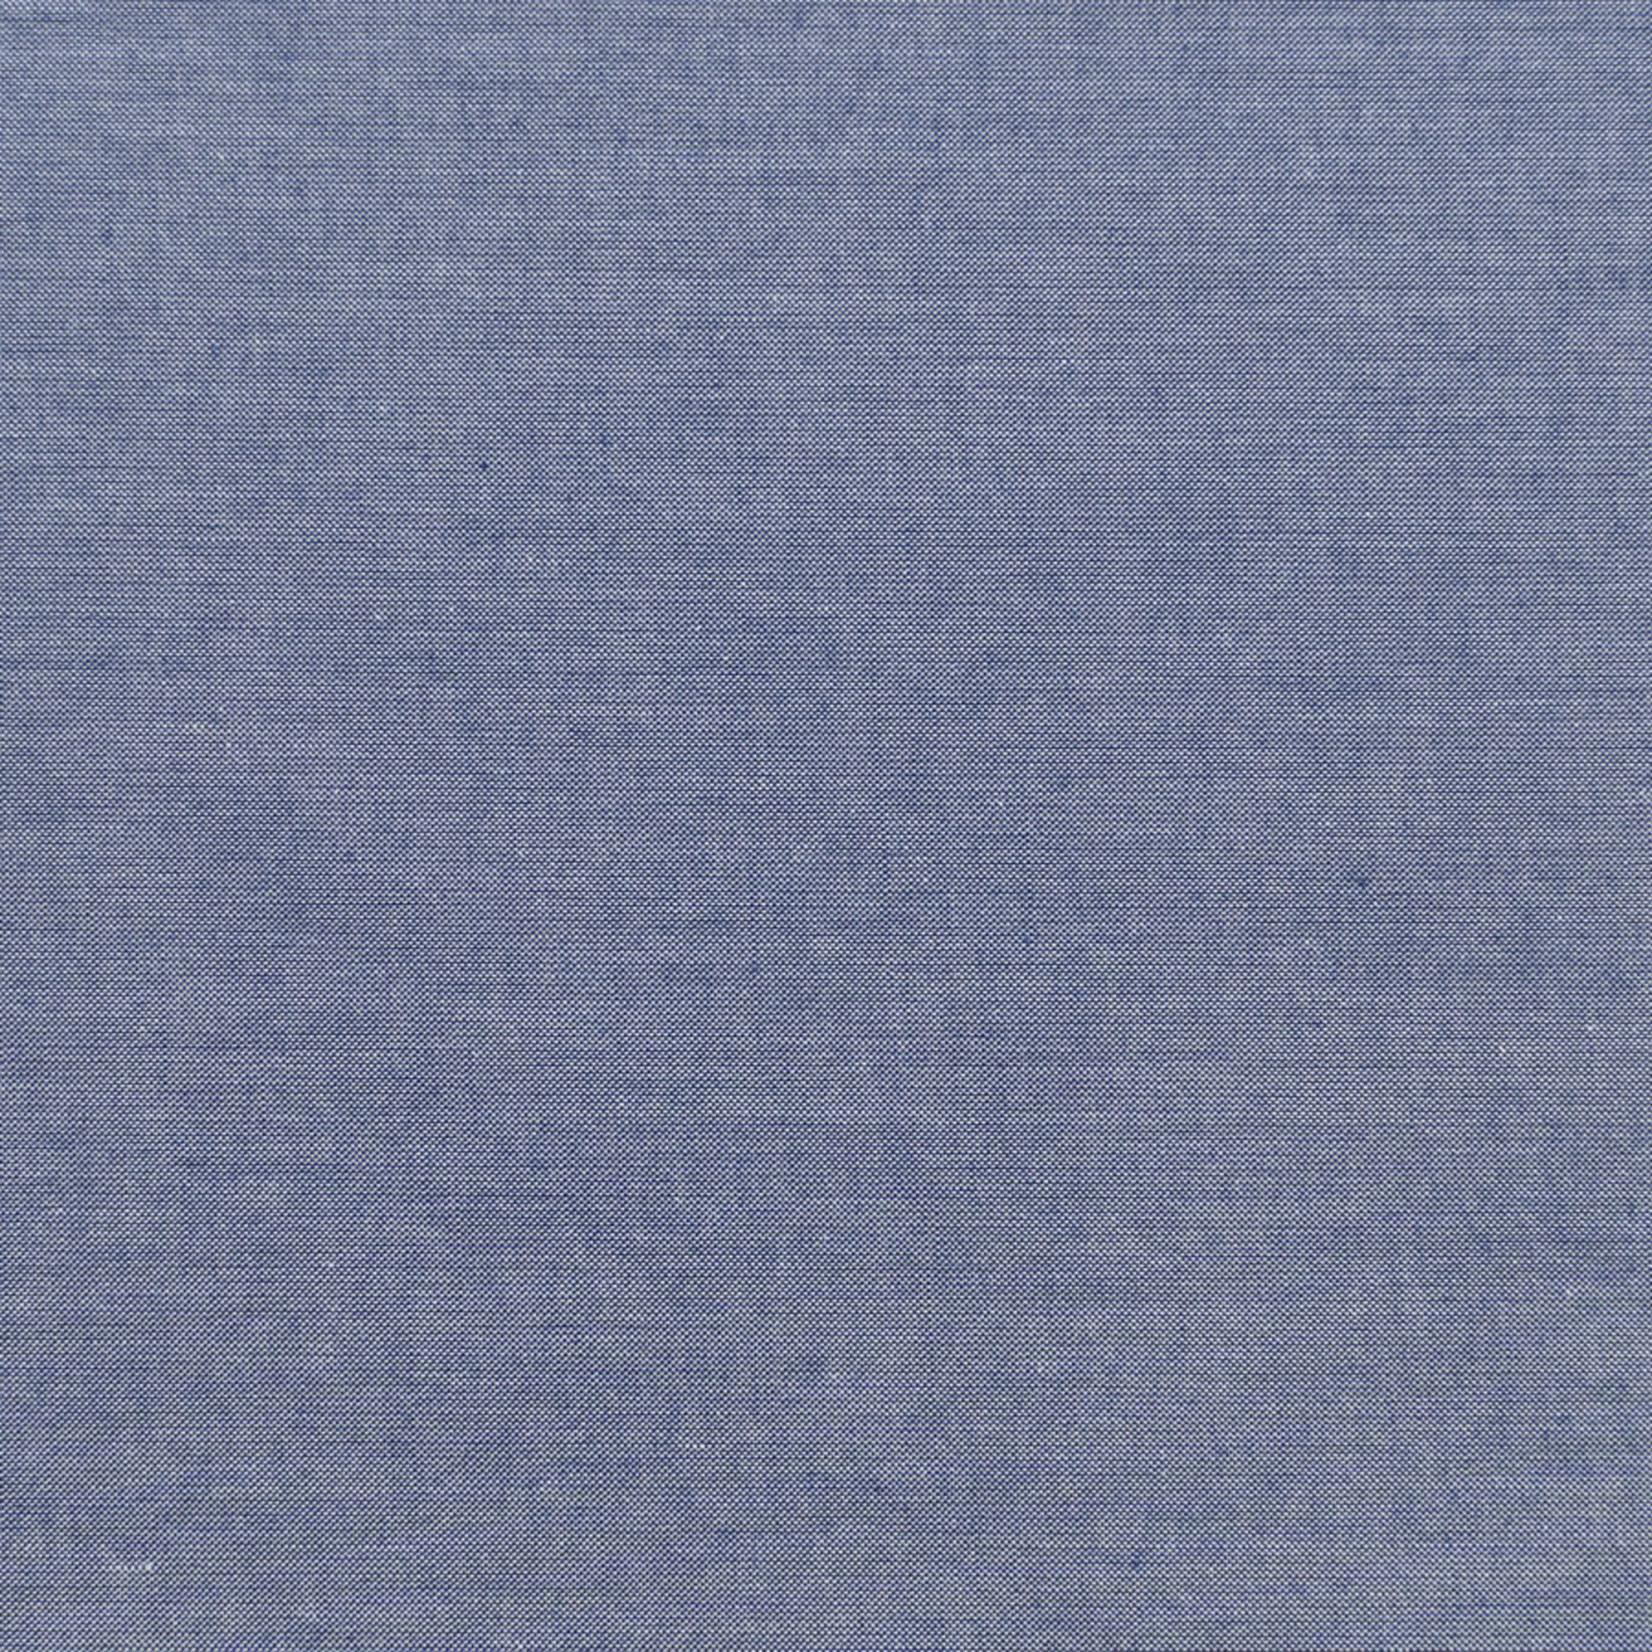 Tilda Tilda Basics, Chambray, Dark Blue 160007 $0.22 per cm or $22/m